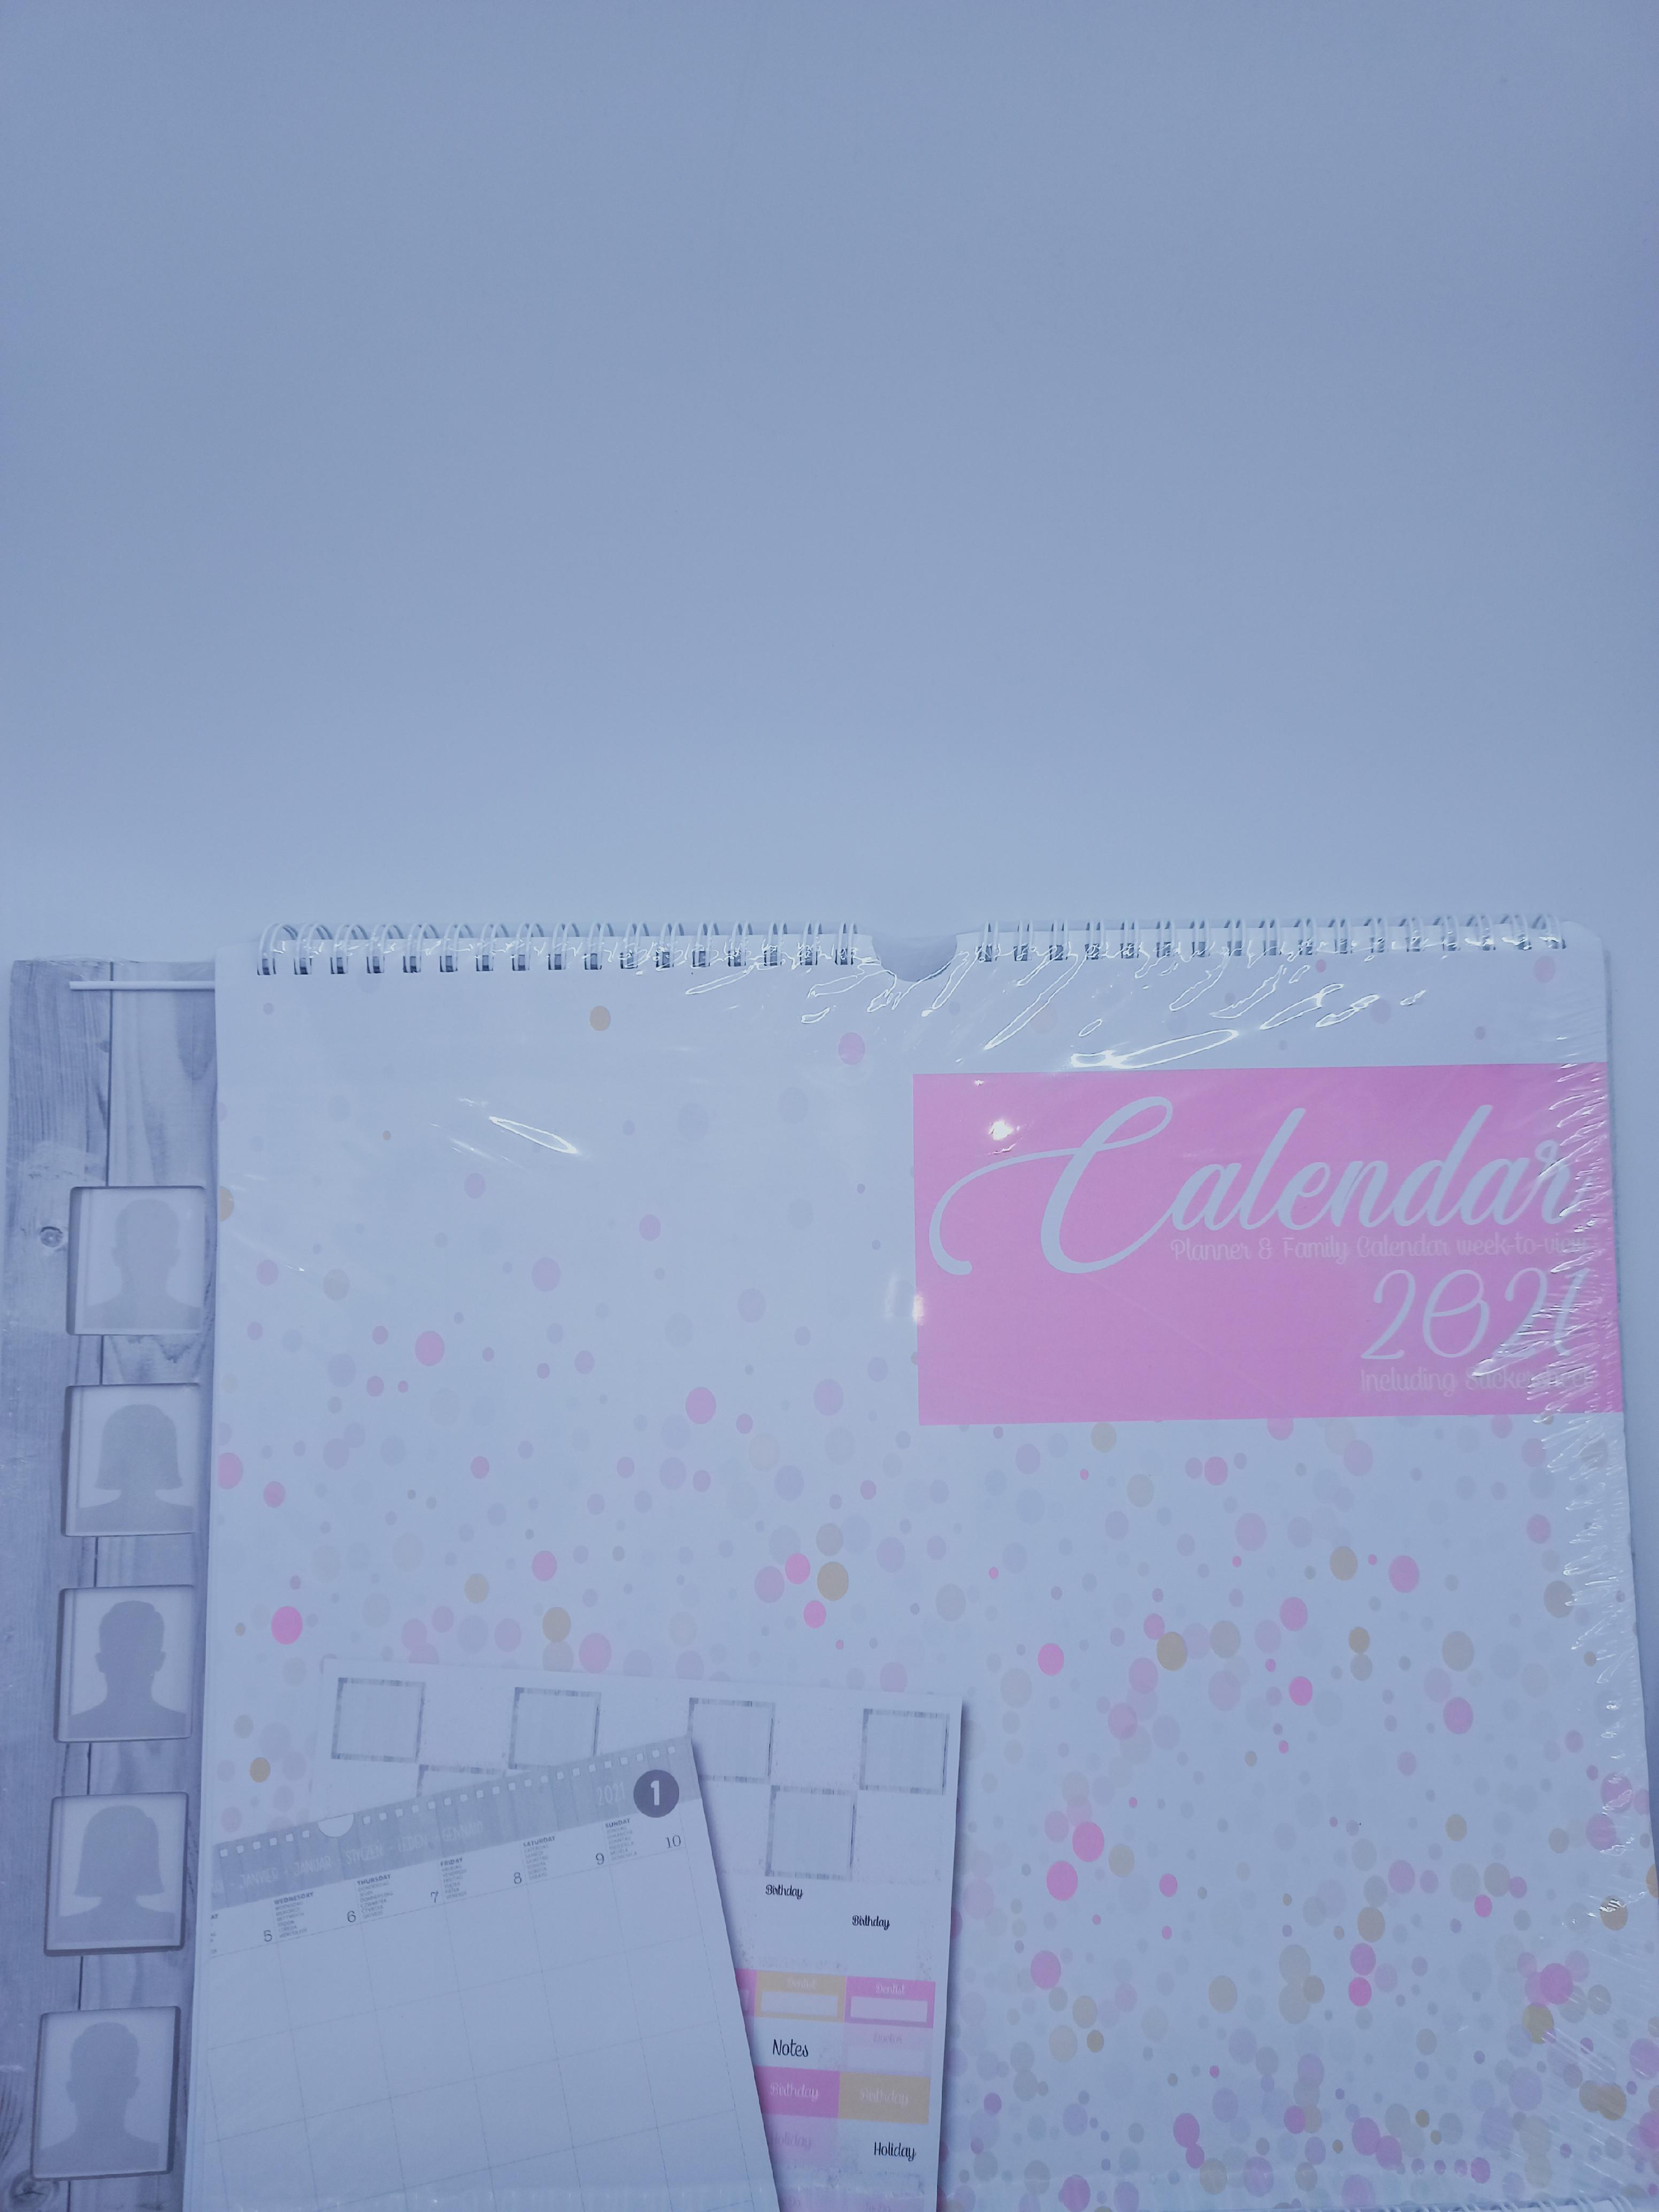 Grafix Rodinný kalendář/plánovač, s 5ti rámečky na fotky Základní barvy: růžová